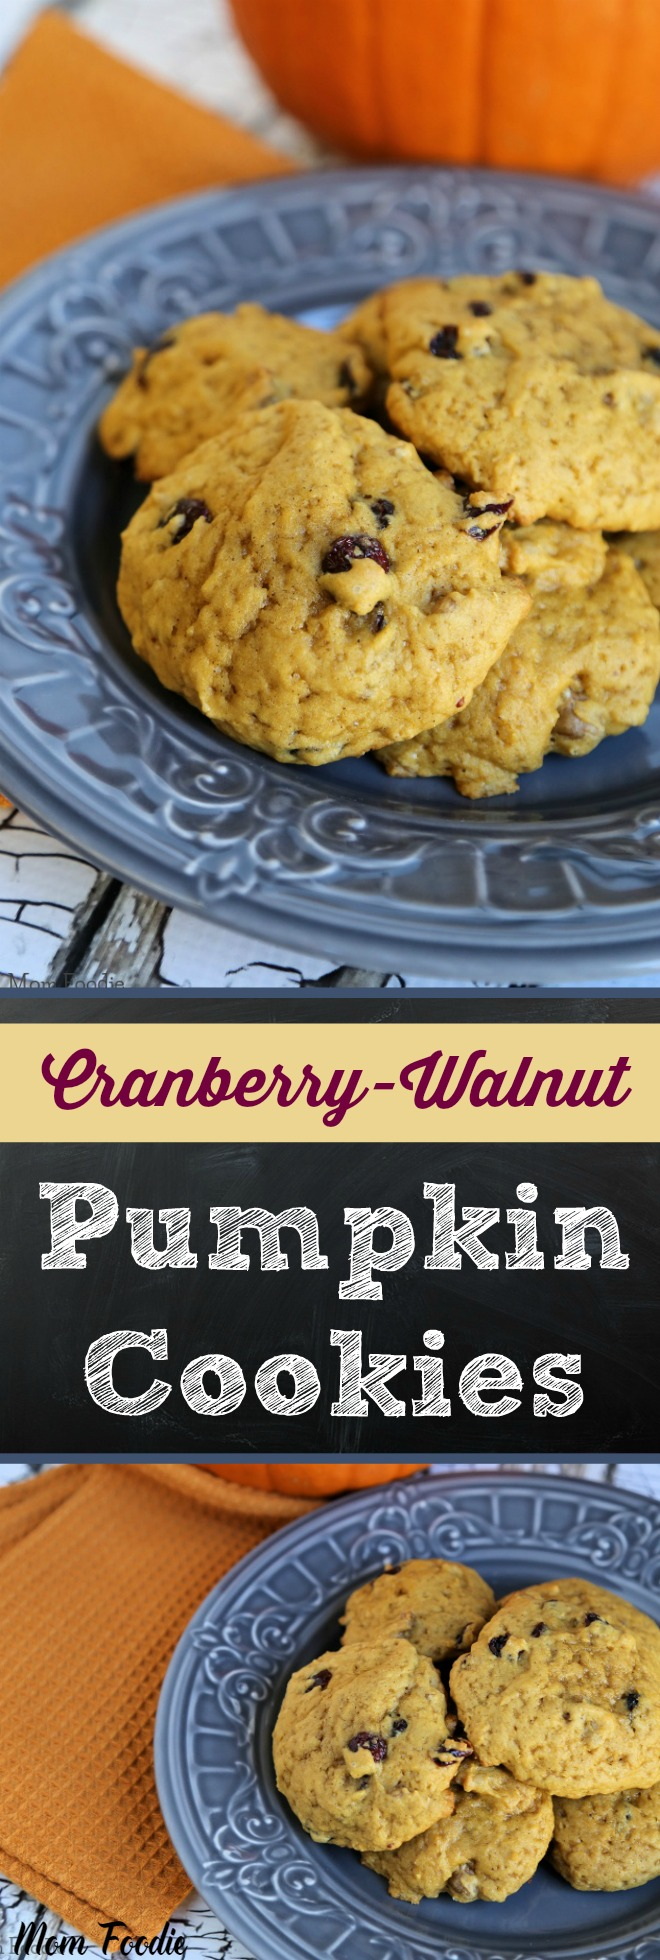 Cranberry Walnut Pumpkin Cookies